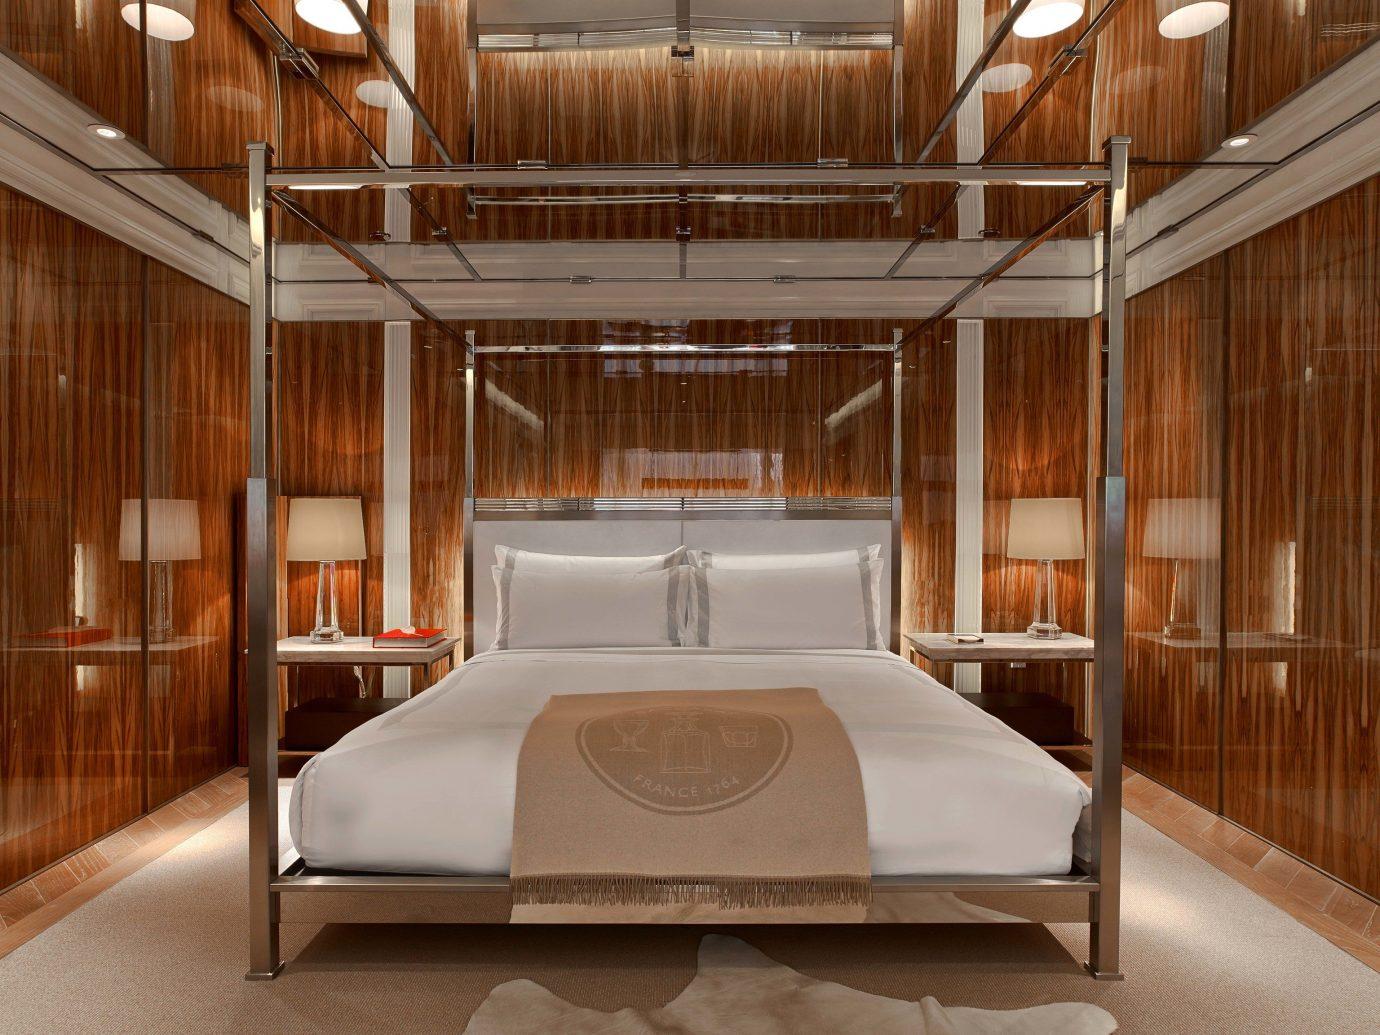 Hotels Luxury Travel indoor floor ceiling room interior design Architecture bed frame wood furniture bed interior designer flooring Bedroom